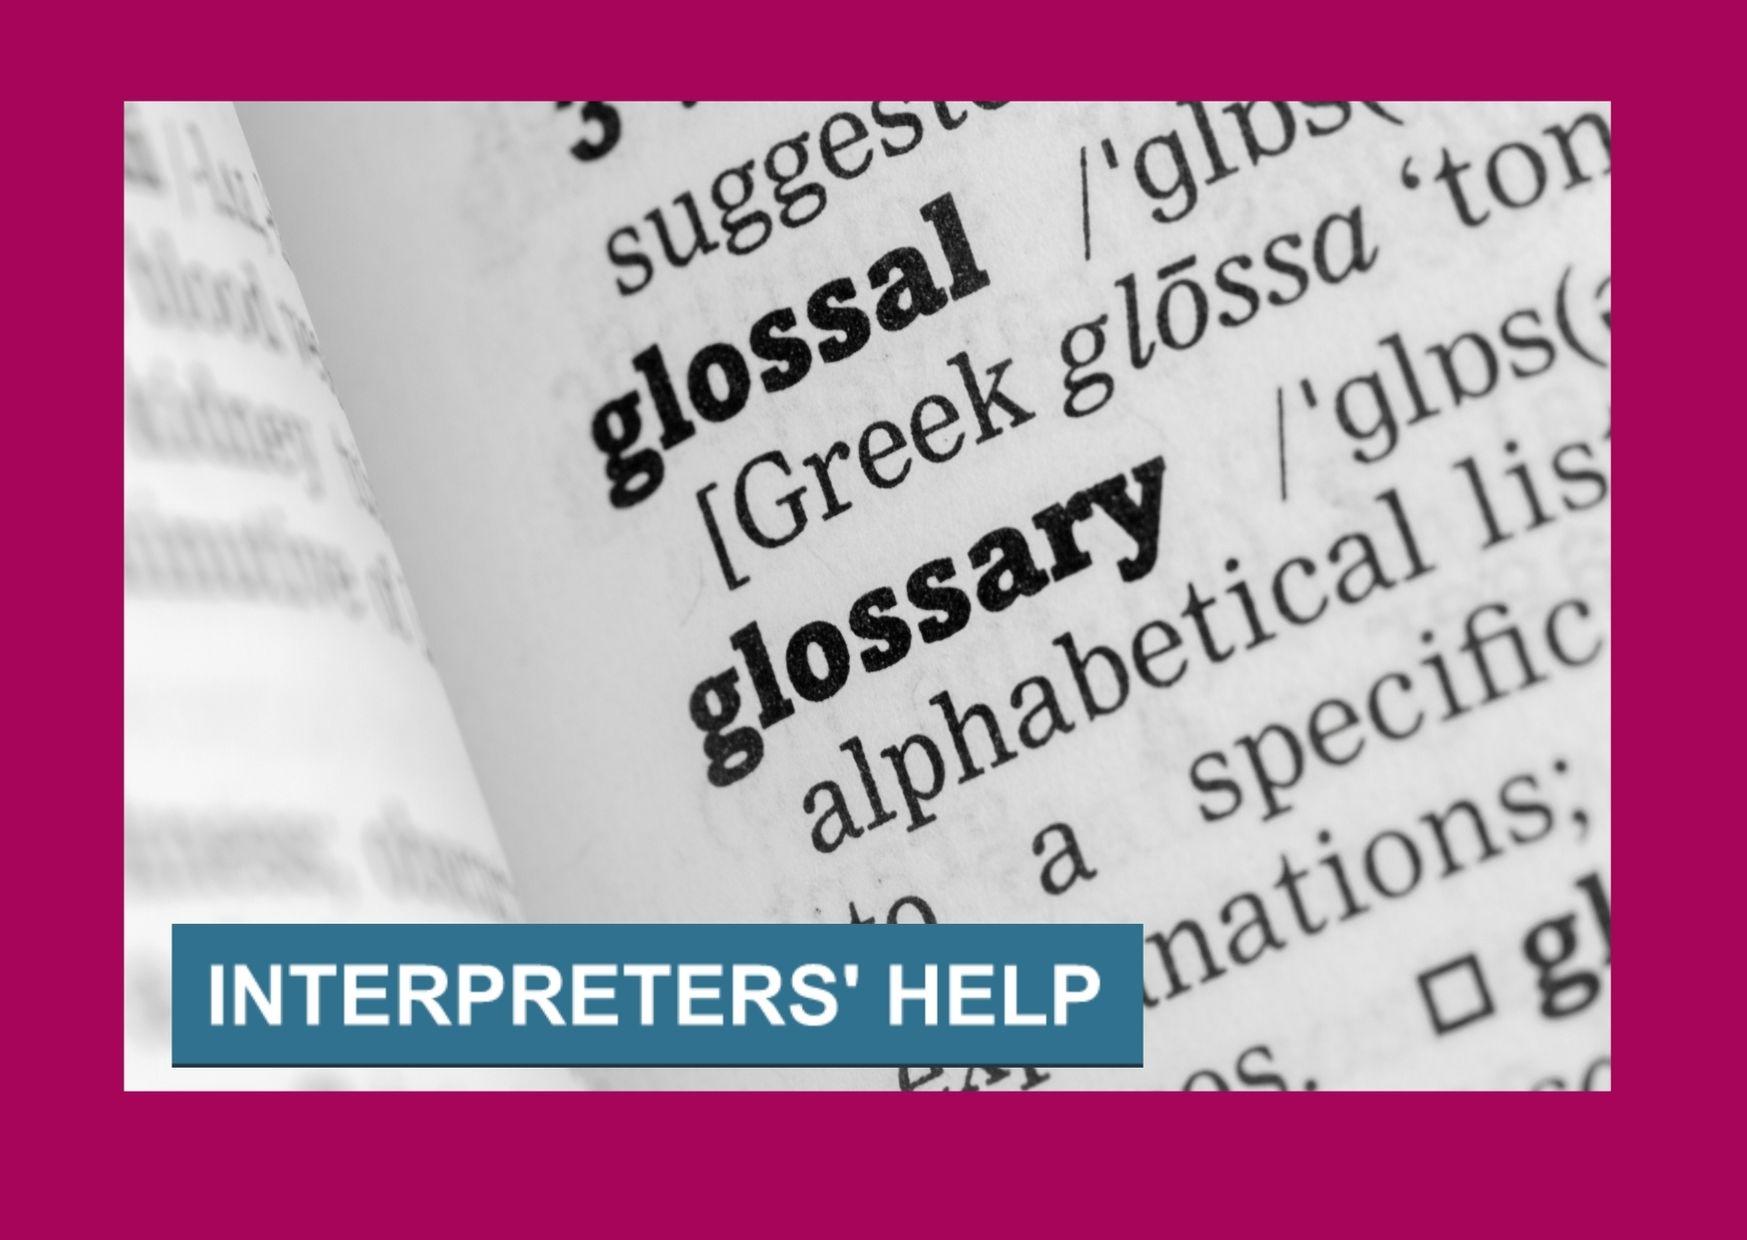 Interpreters' Help upsell offer